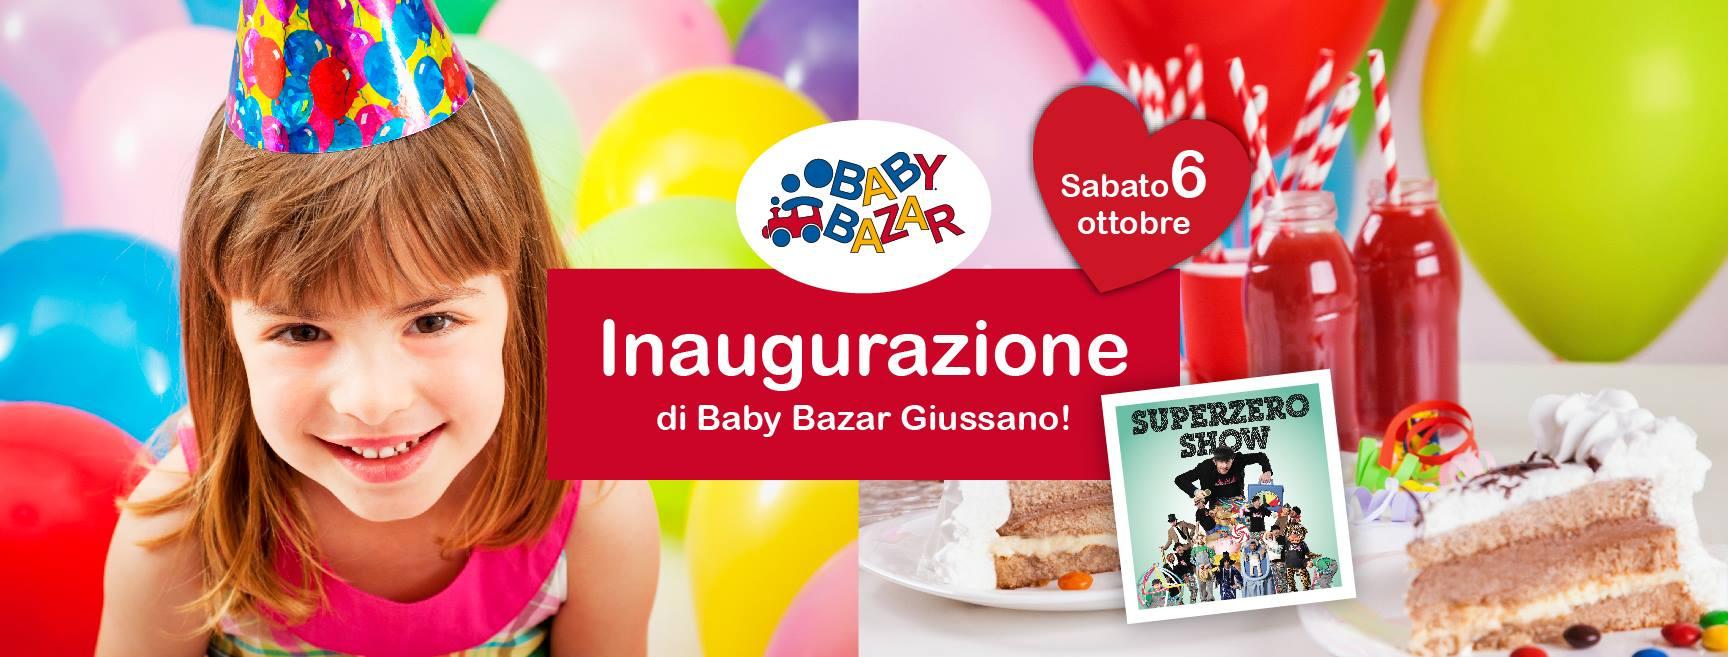 baby-bazar-giussano